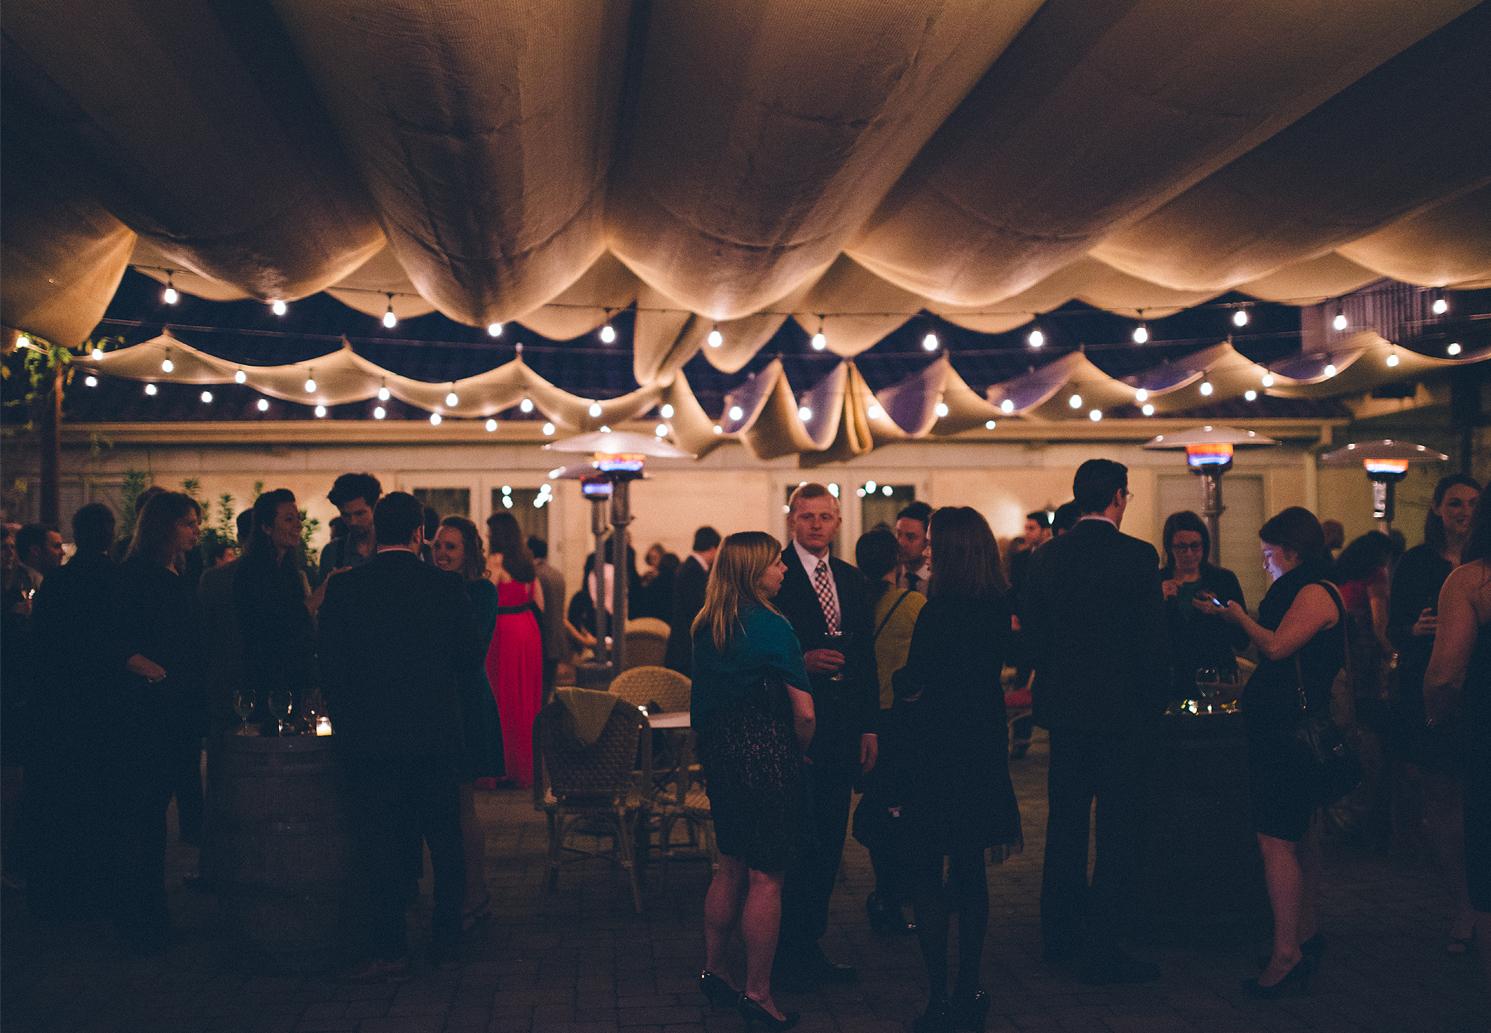 sonoma wedding at ramekins culinary063